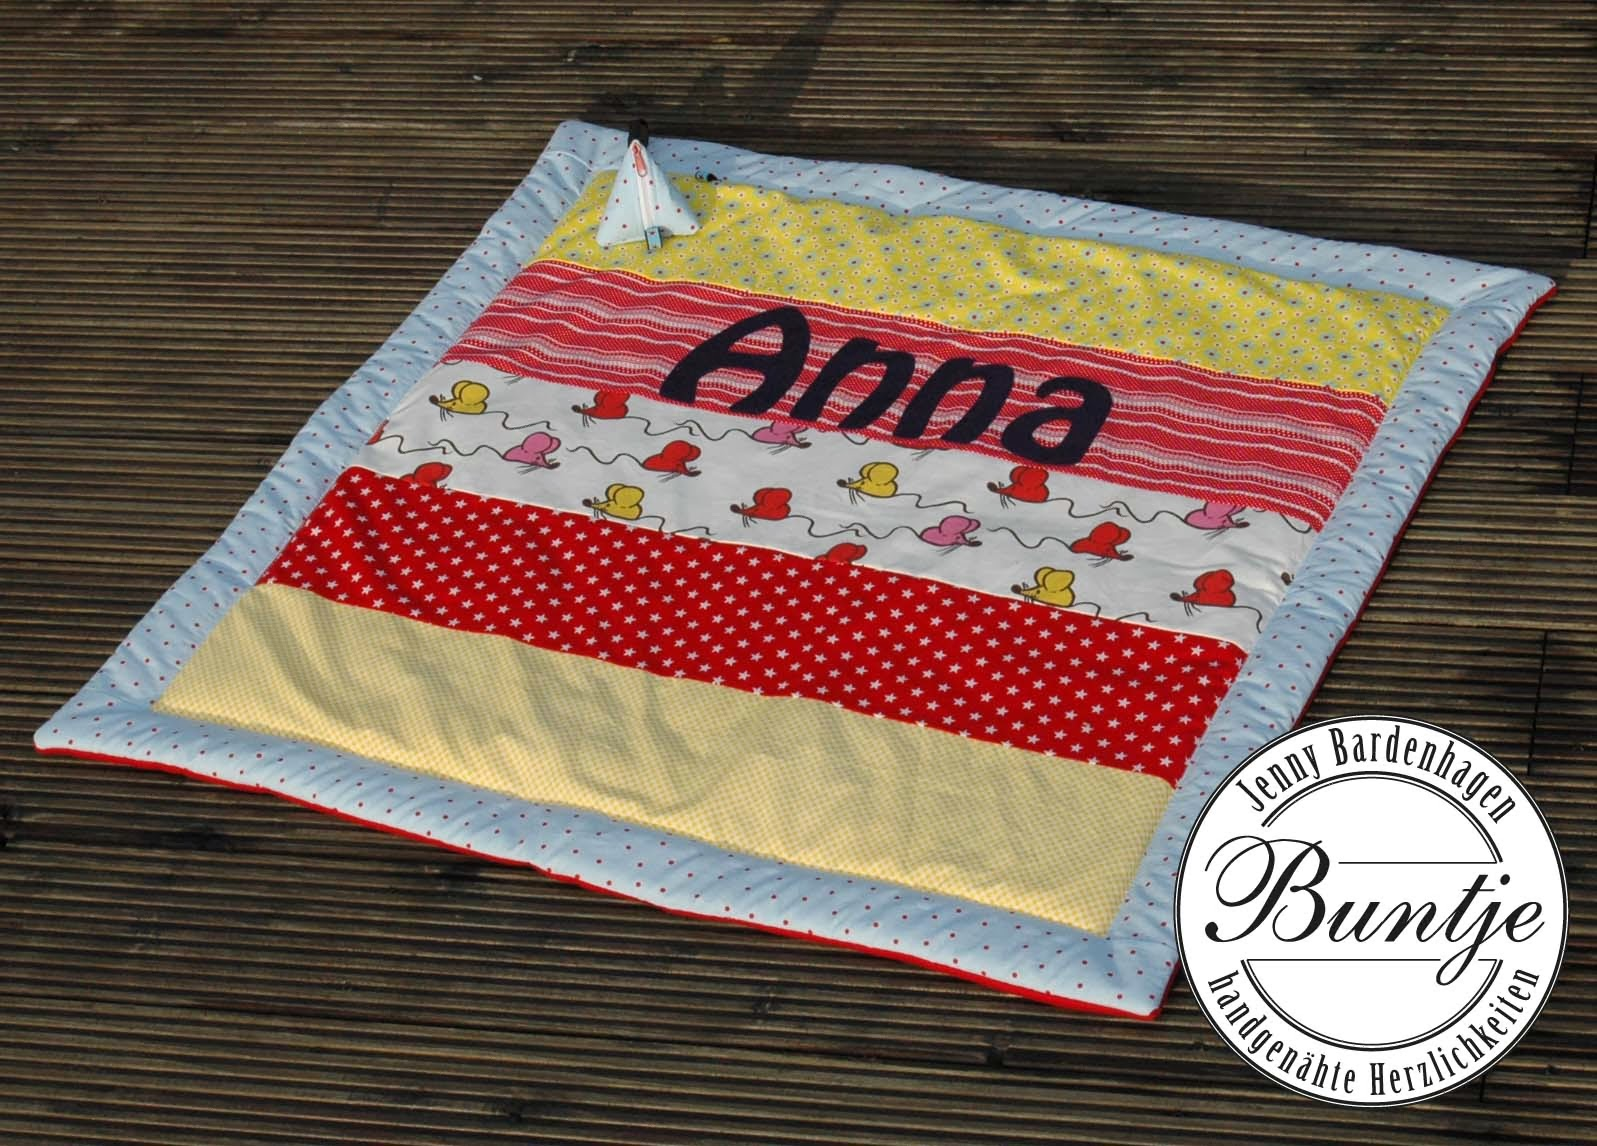 Krabbeldecke Decke Baby Mädchen Name Geschenk Geburt Taufe rot gelb hellblau Mäuse Tiere Baumwolle Fleece dick handmade Nähen Buntje